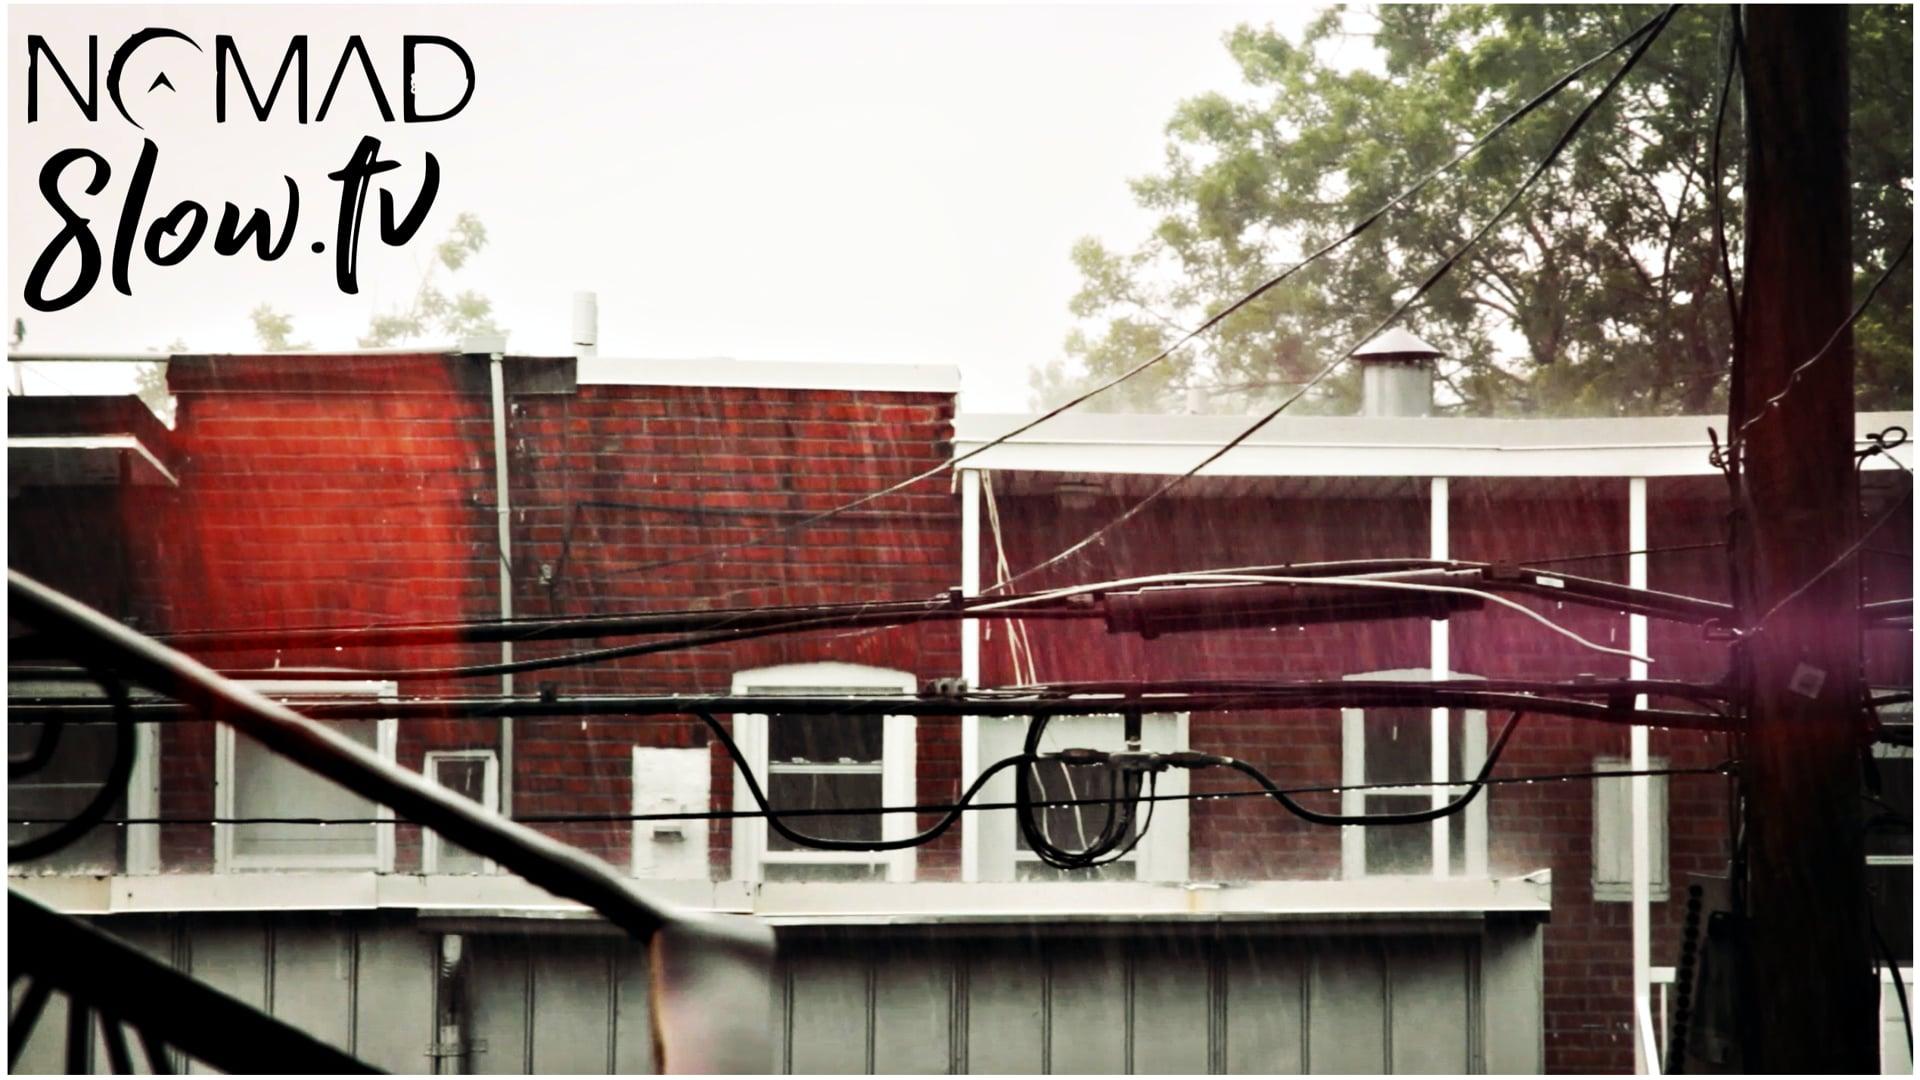 After the Rain - Boundary - Still Life - 08 - Moebius.mp4